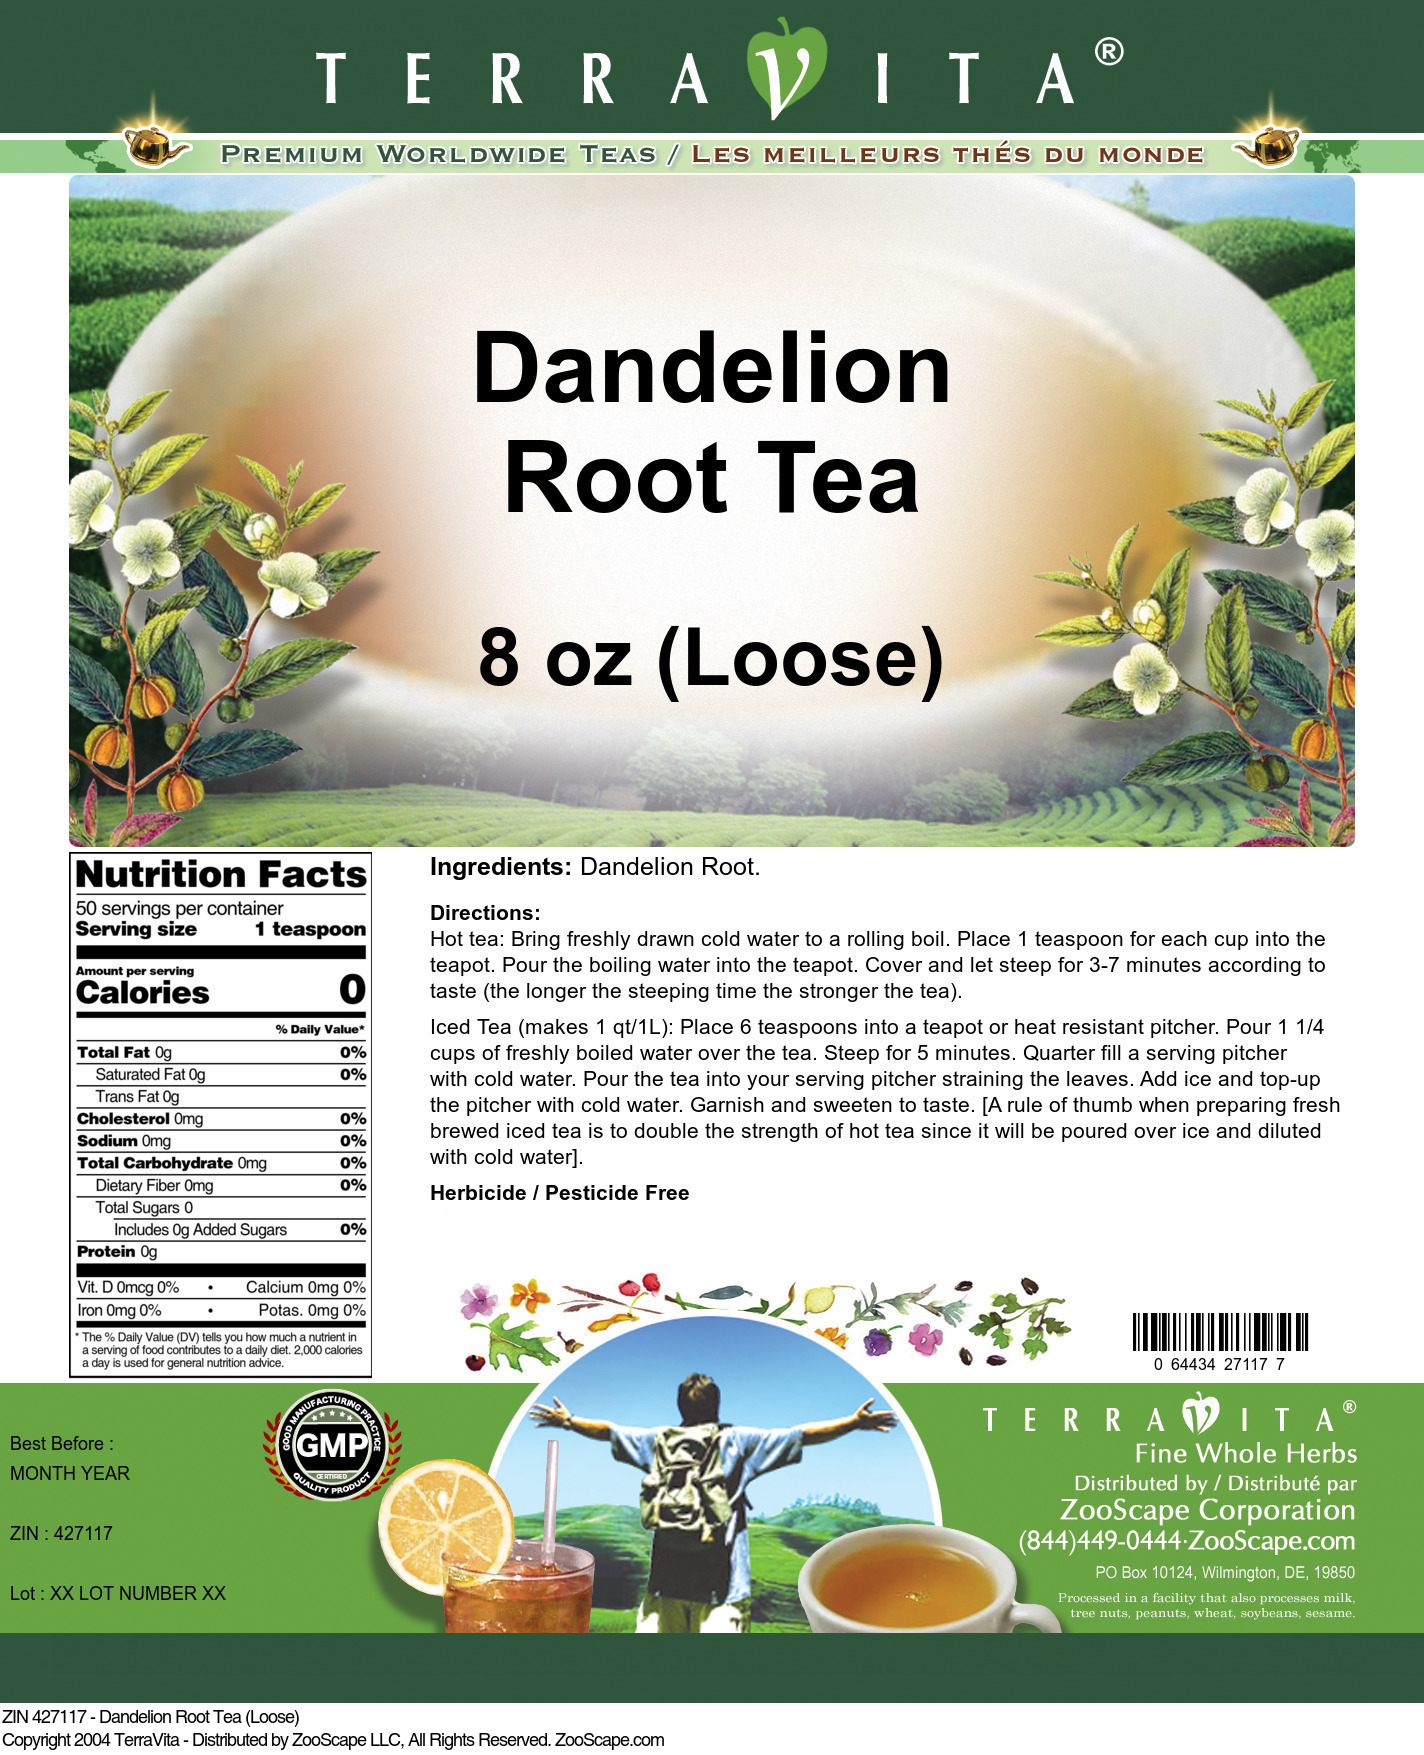 Dandelion Root Tea (Loose)